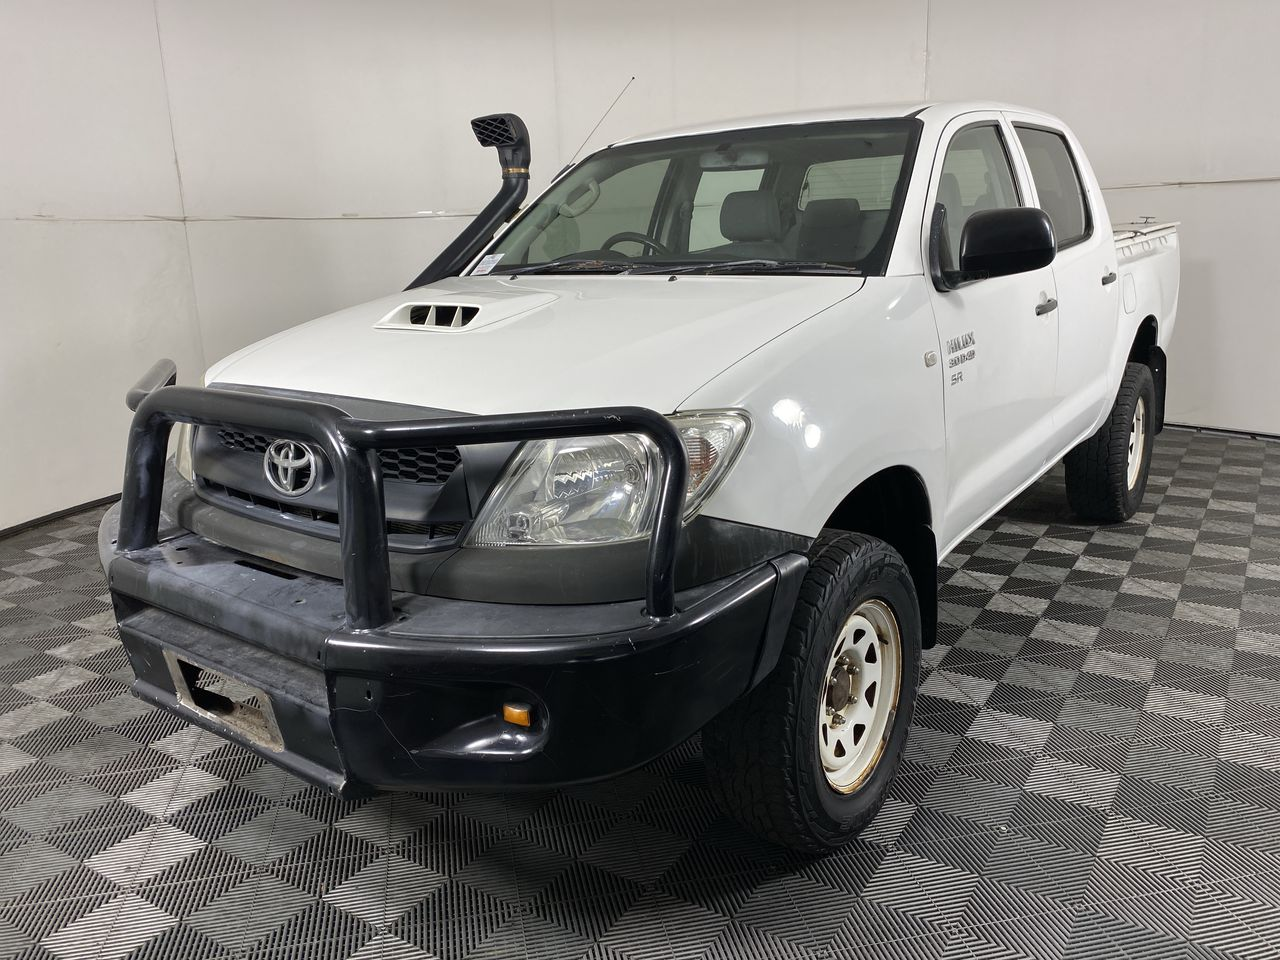 Toyota Hilux SR (4x4) KUN26R Turbo Diesel Manual Crew Cab Chassis